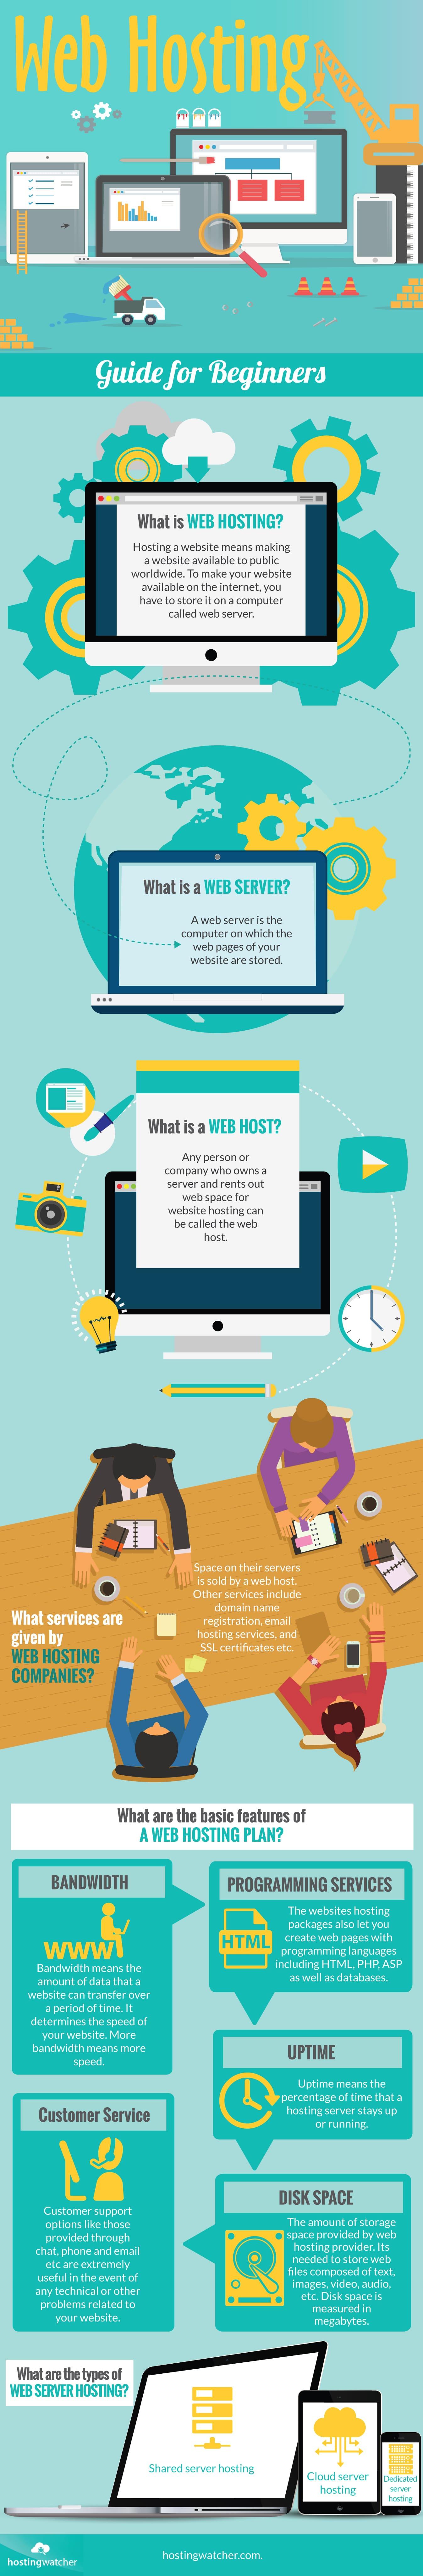 web hosting infographic